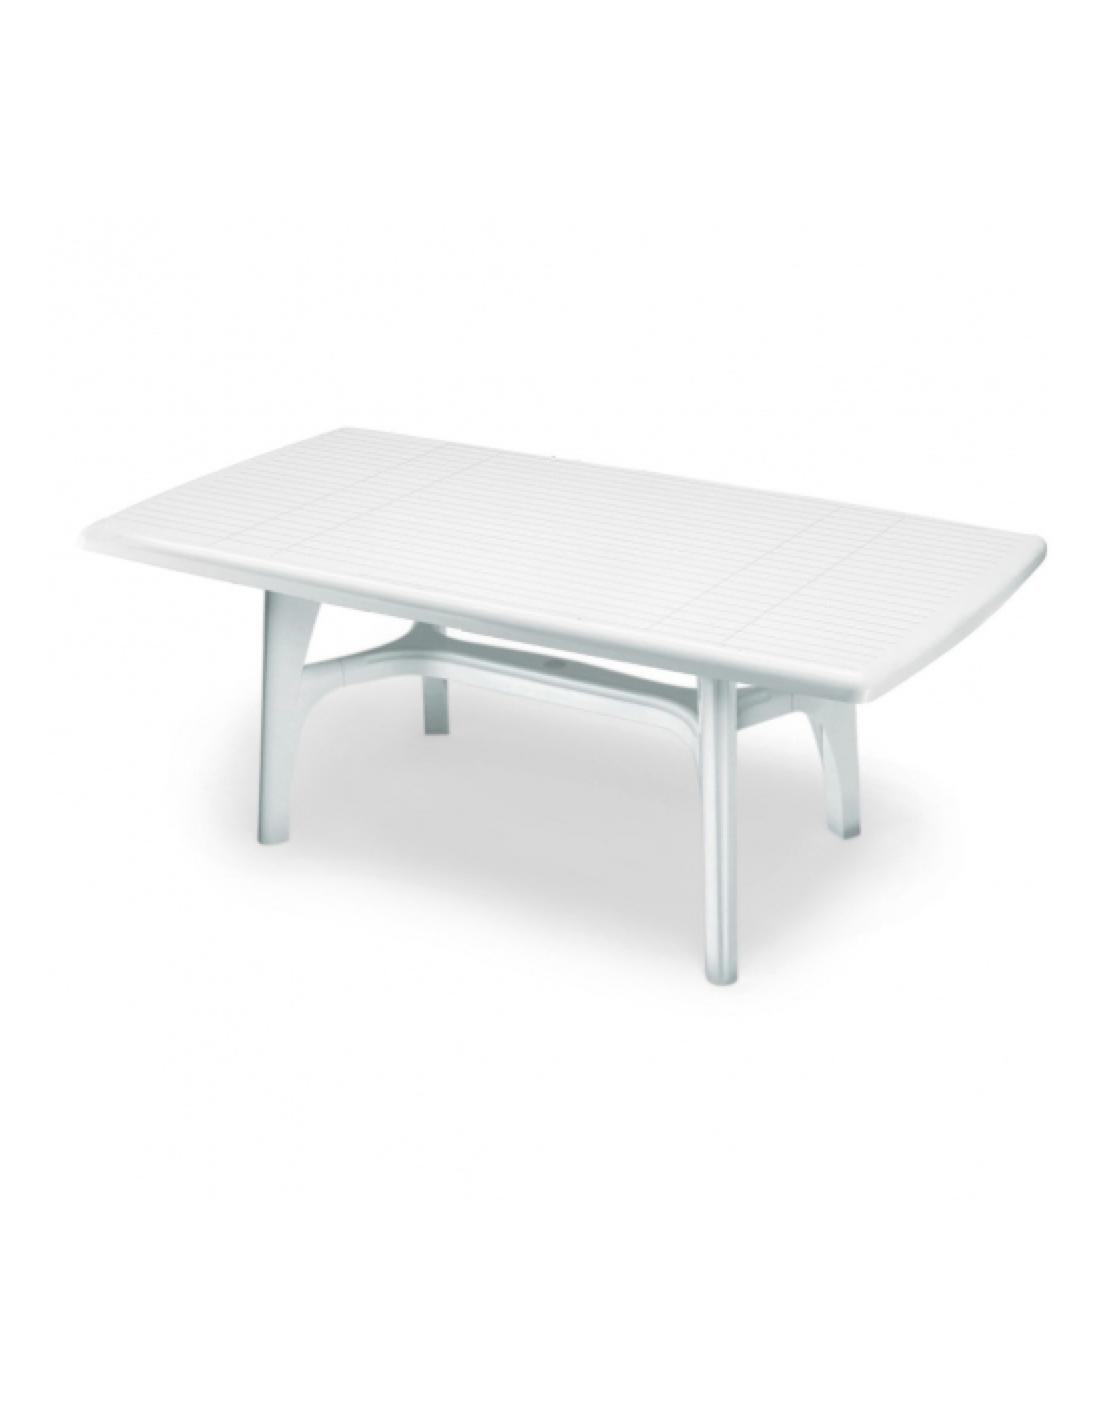 tavolo-da-giardino-allungabile-design